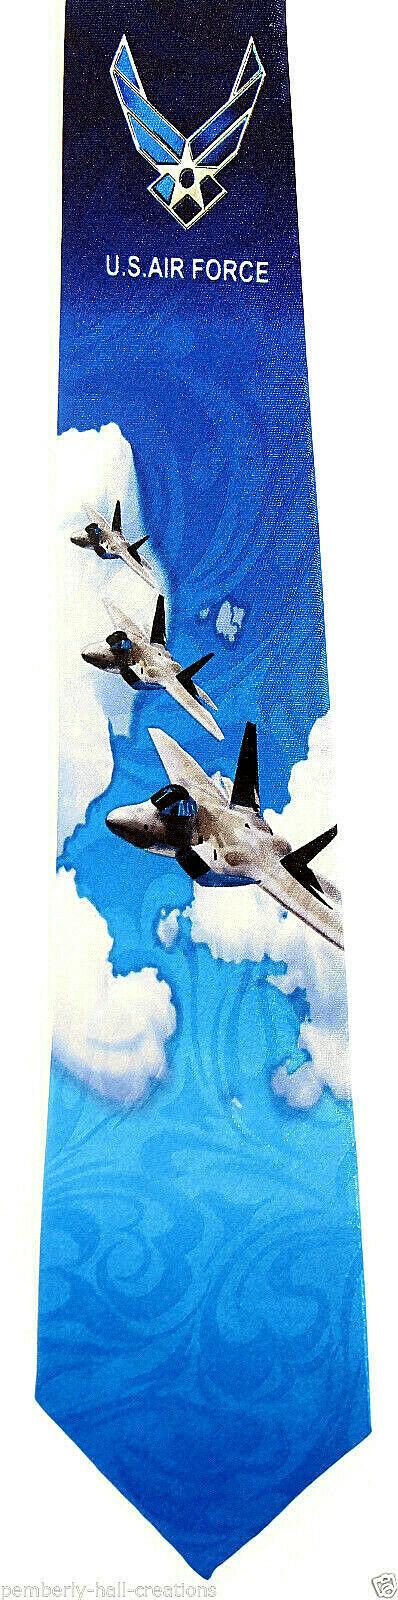 US Air Force Men's Necktie American Military Pilot Airplane Jet Blue Neck Tie